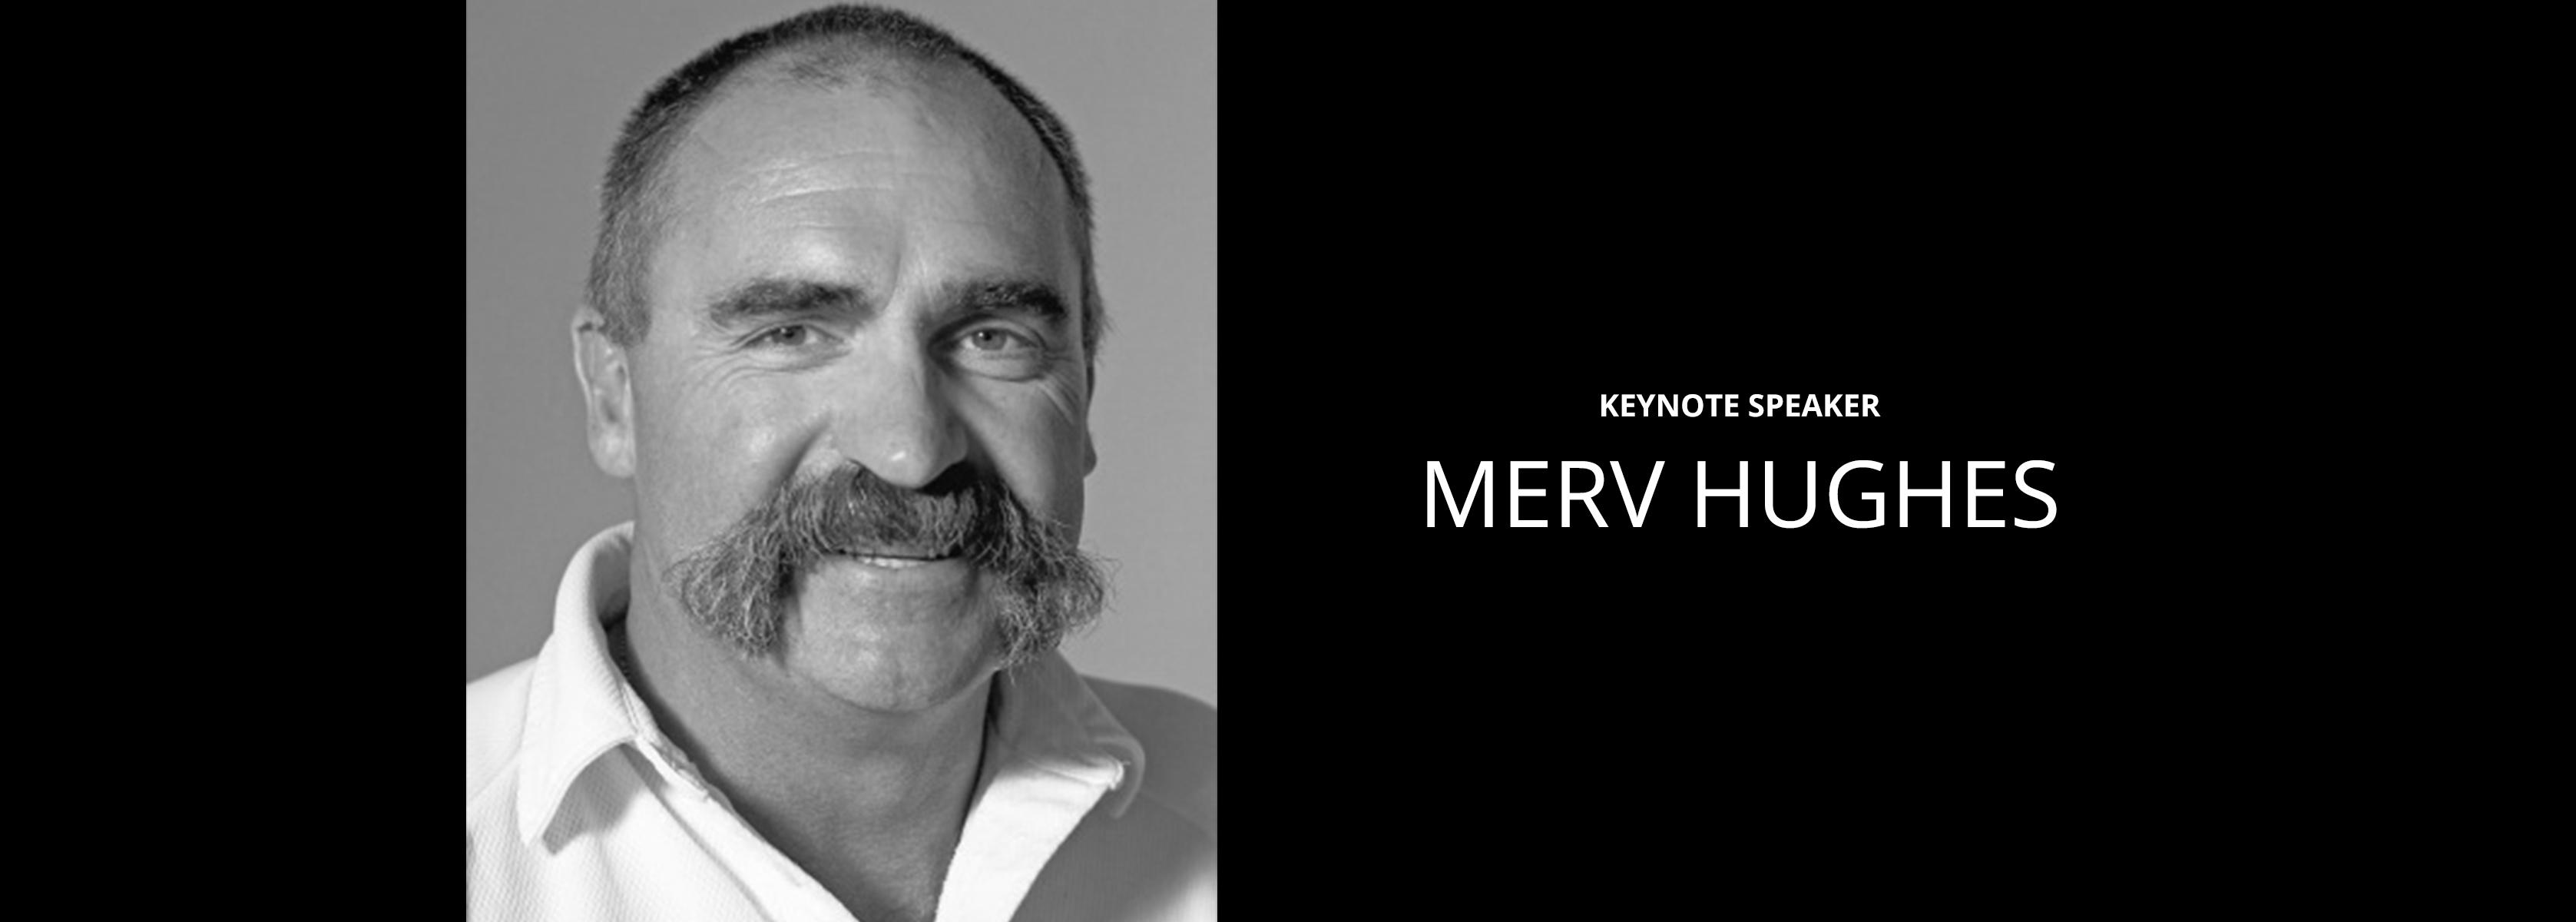 Merv Hughes - Keynote Speaker - Bravo Talent Management